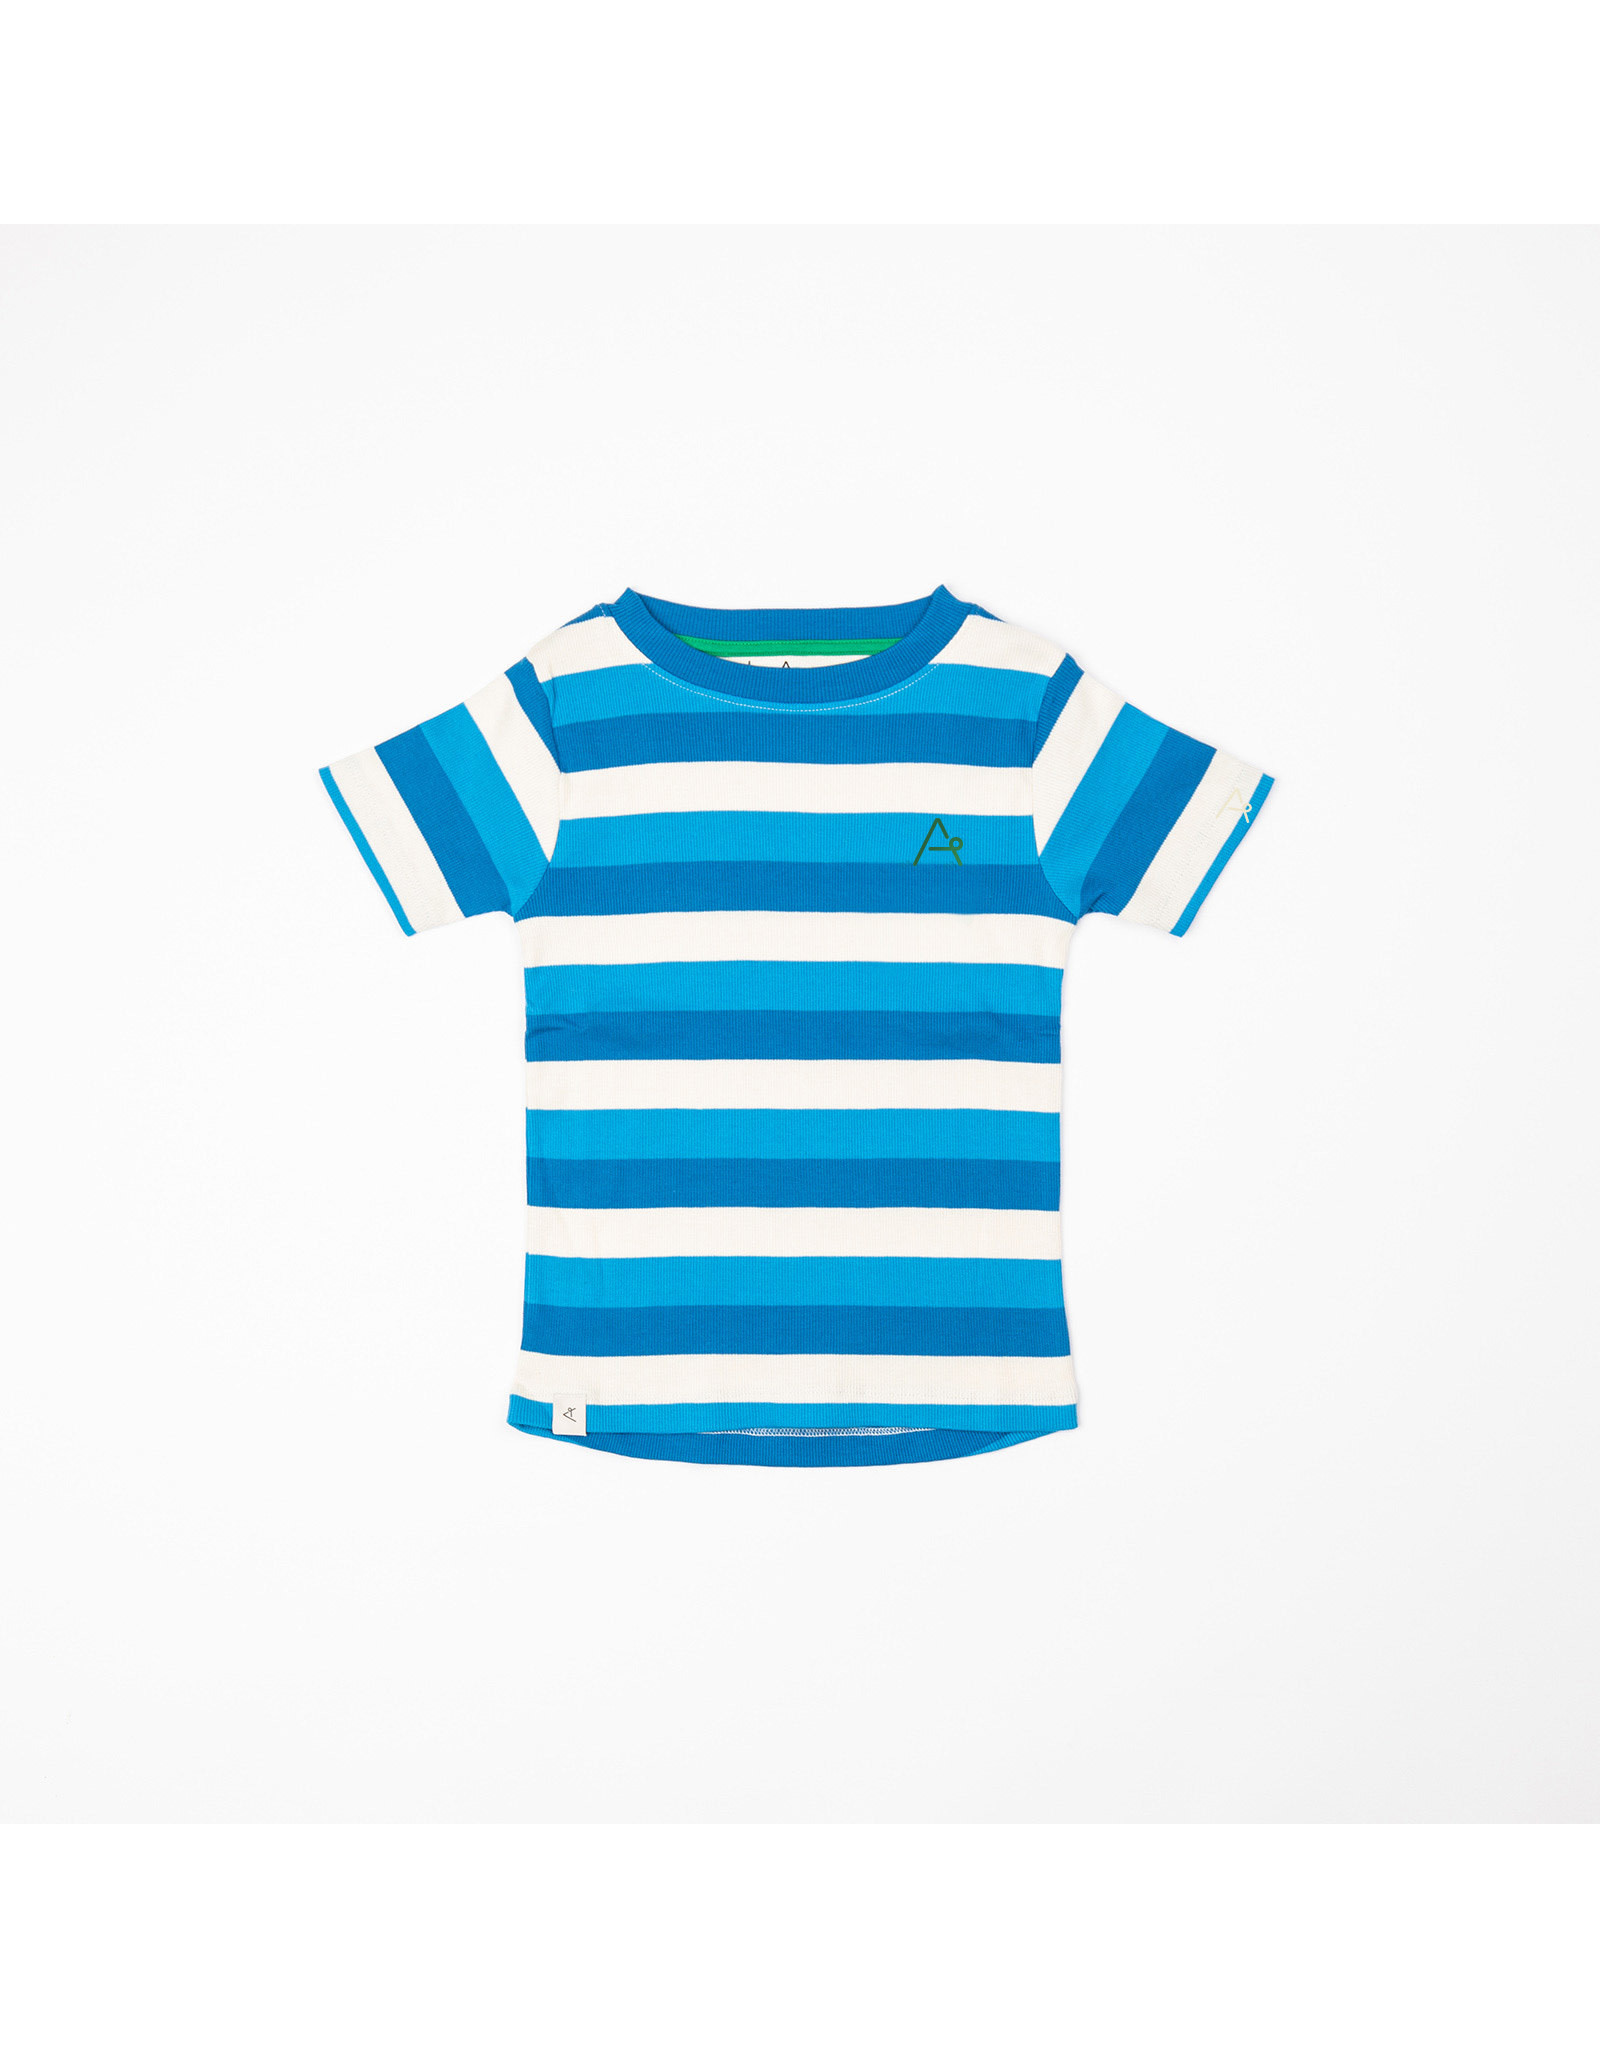 ALBA of Denmark Blauw-wit gestreepte t-shirt